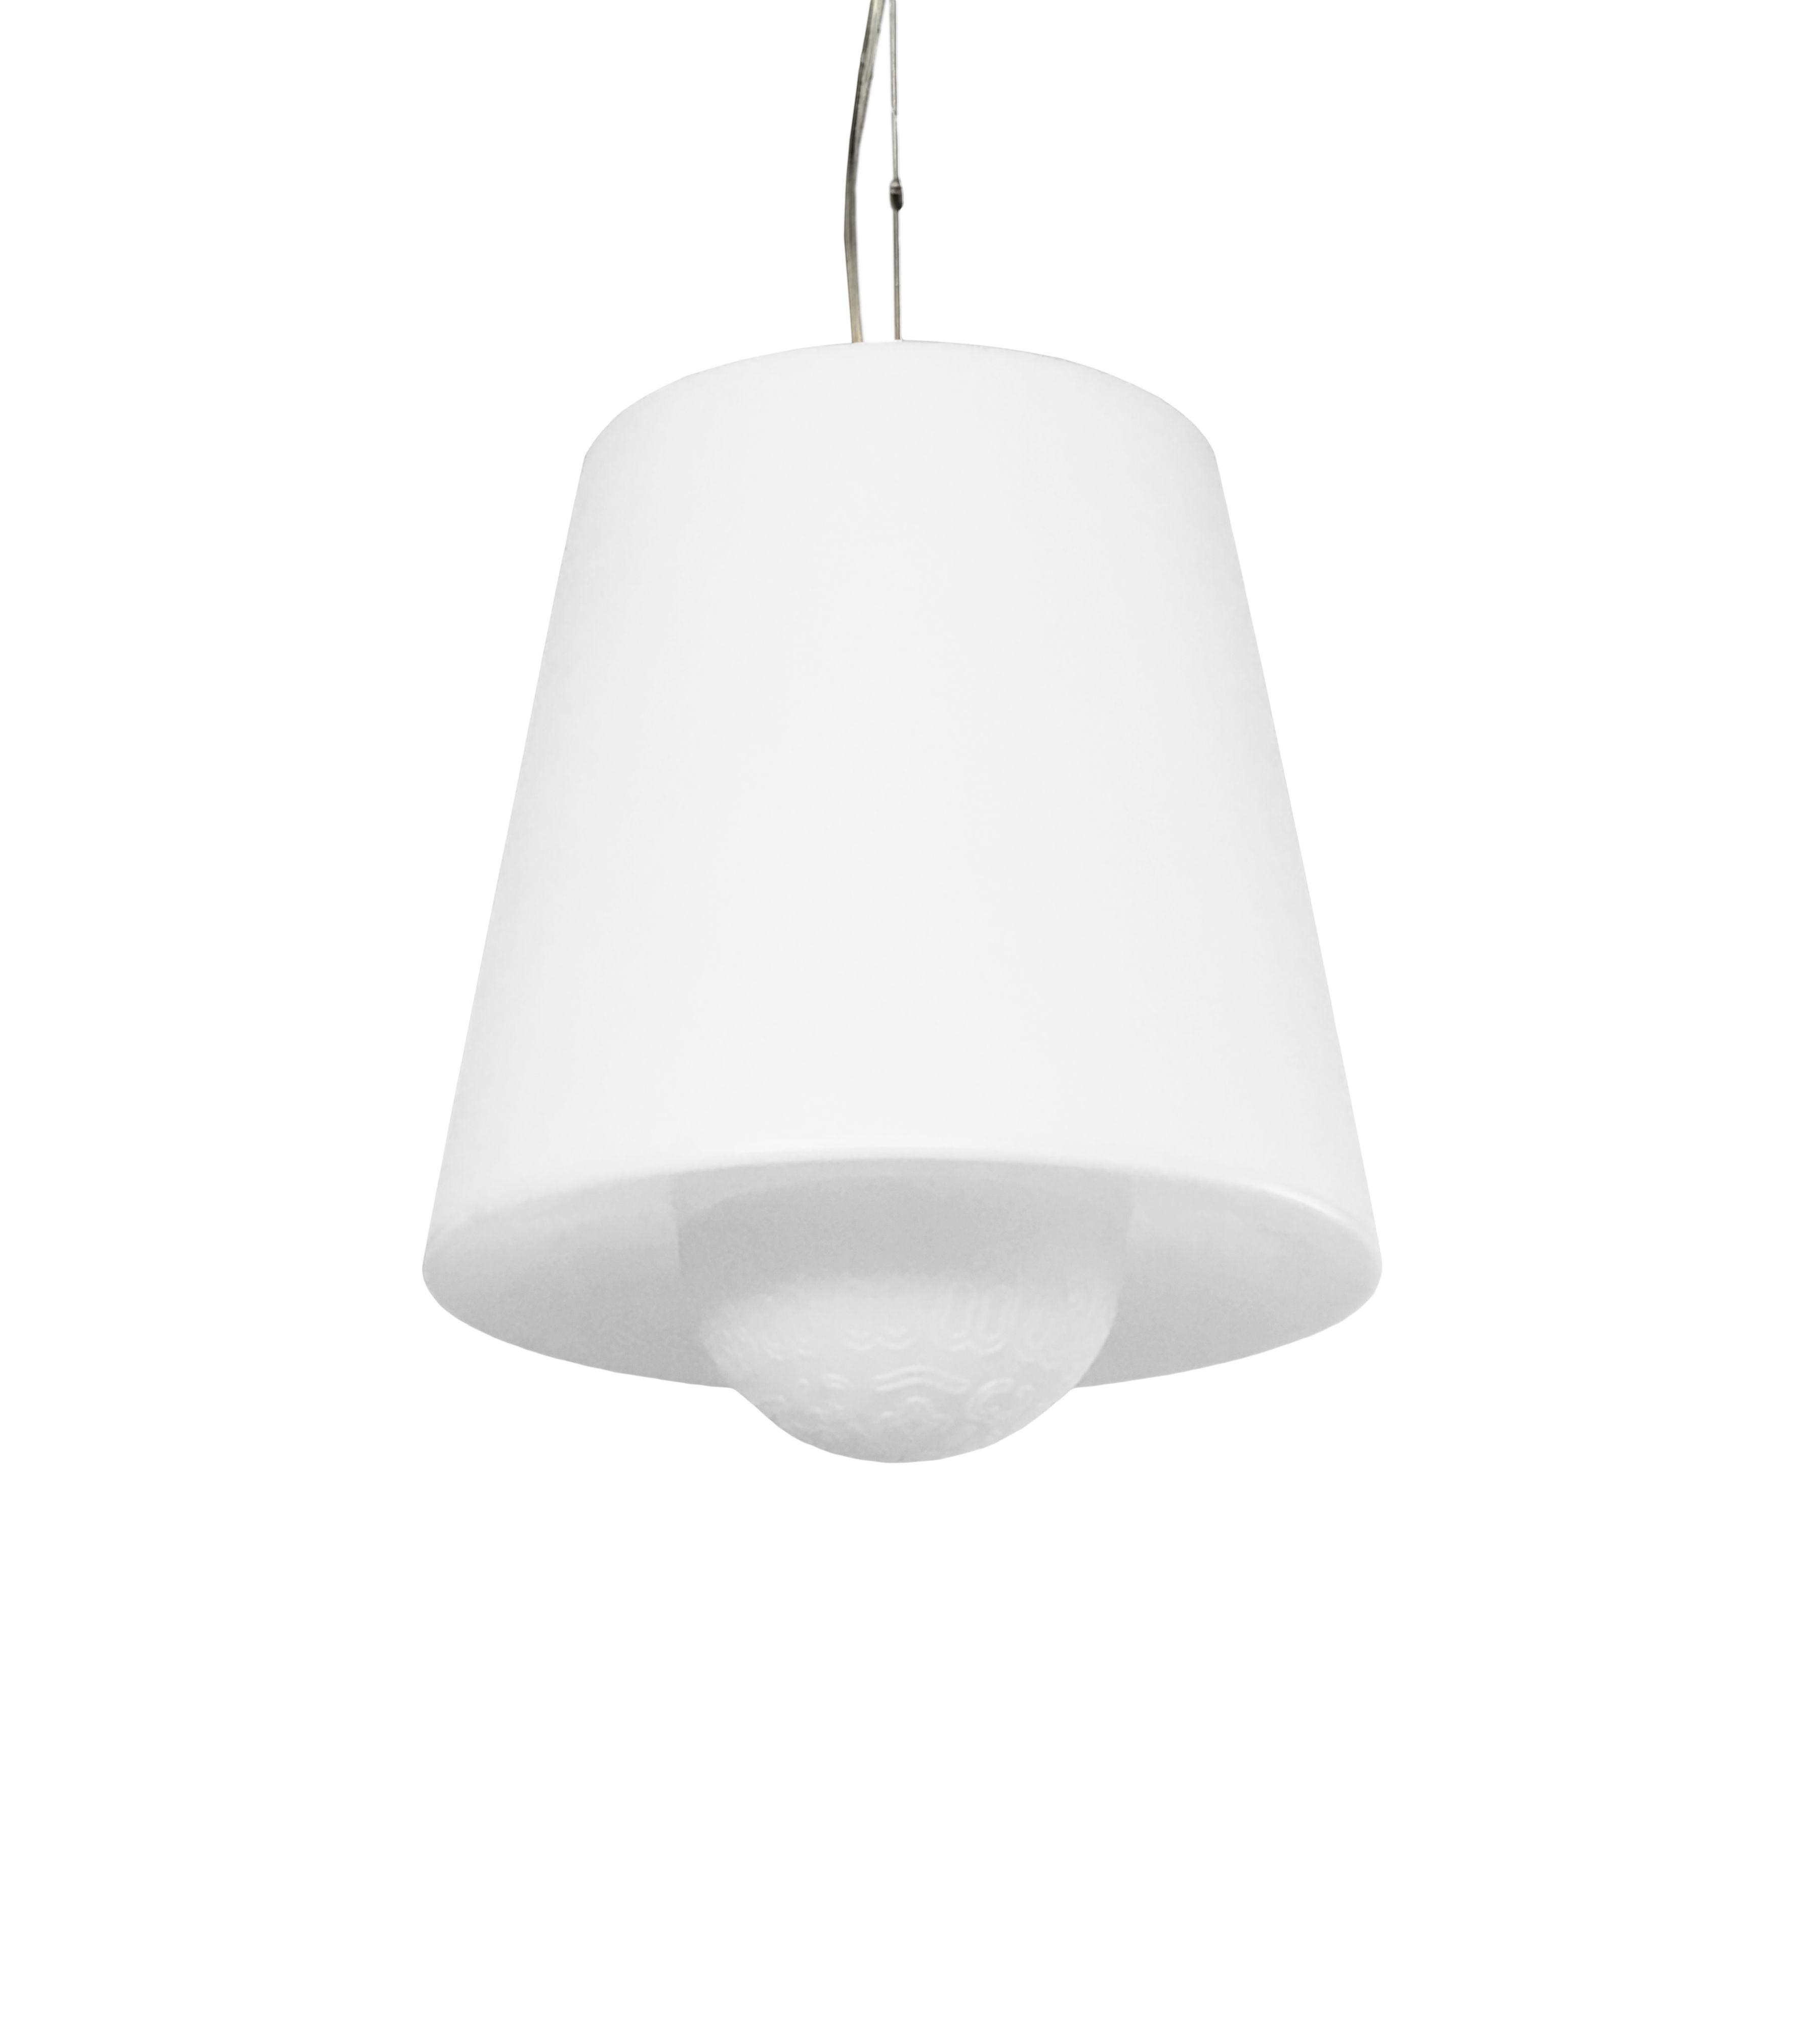 Luminaire - Suspensions - Suspension Ali Baba / Ø 43 x H 47 cm - Slide - Blanc - polyéthène recyclable